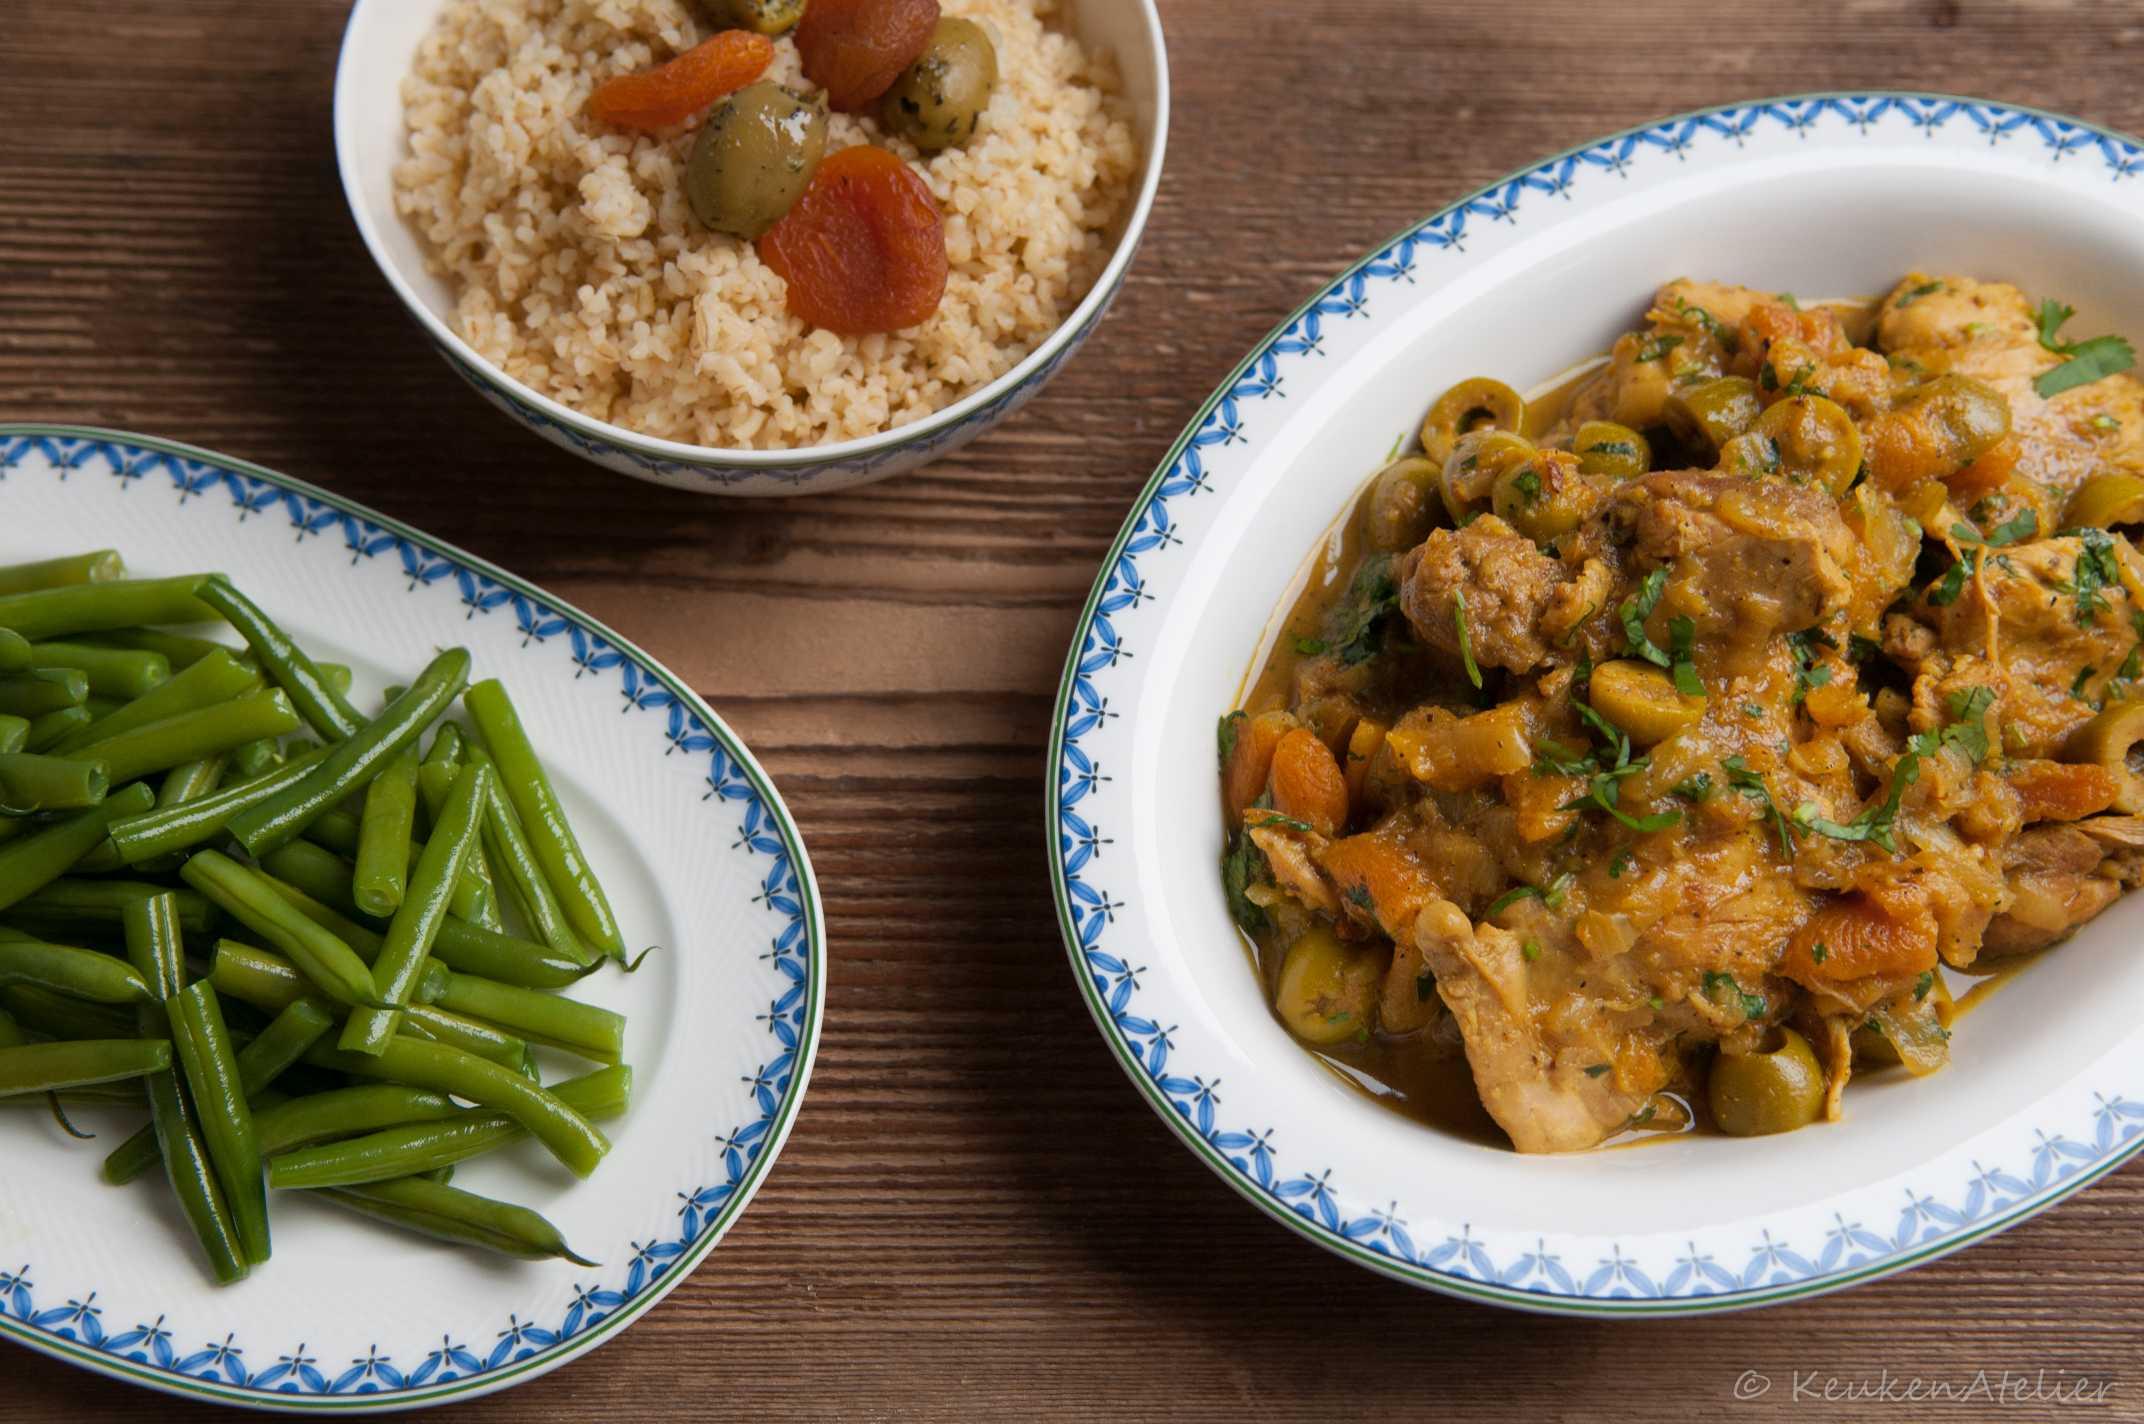 Marokkaanse kip met abrikozen en olijven | KeukenAtelier